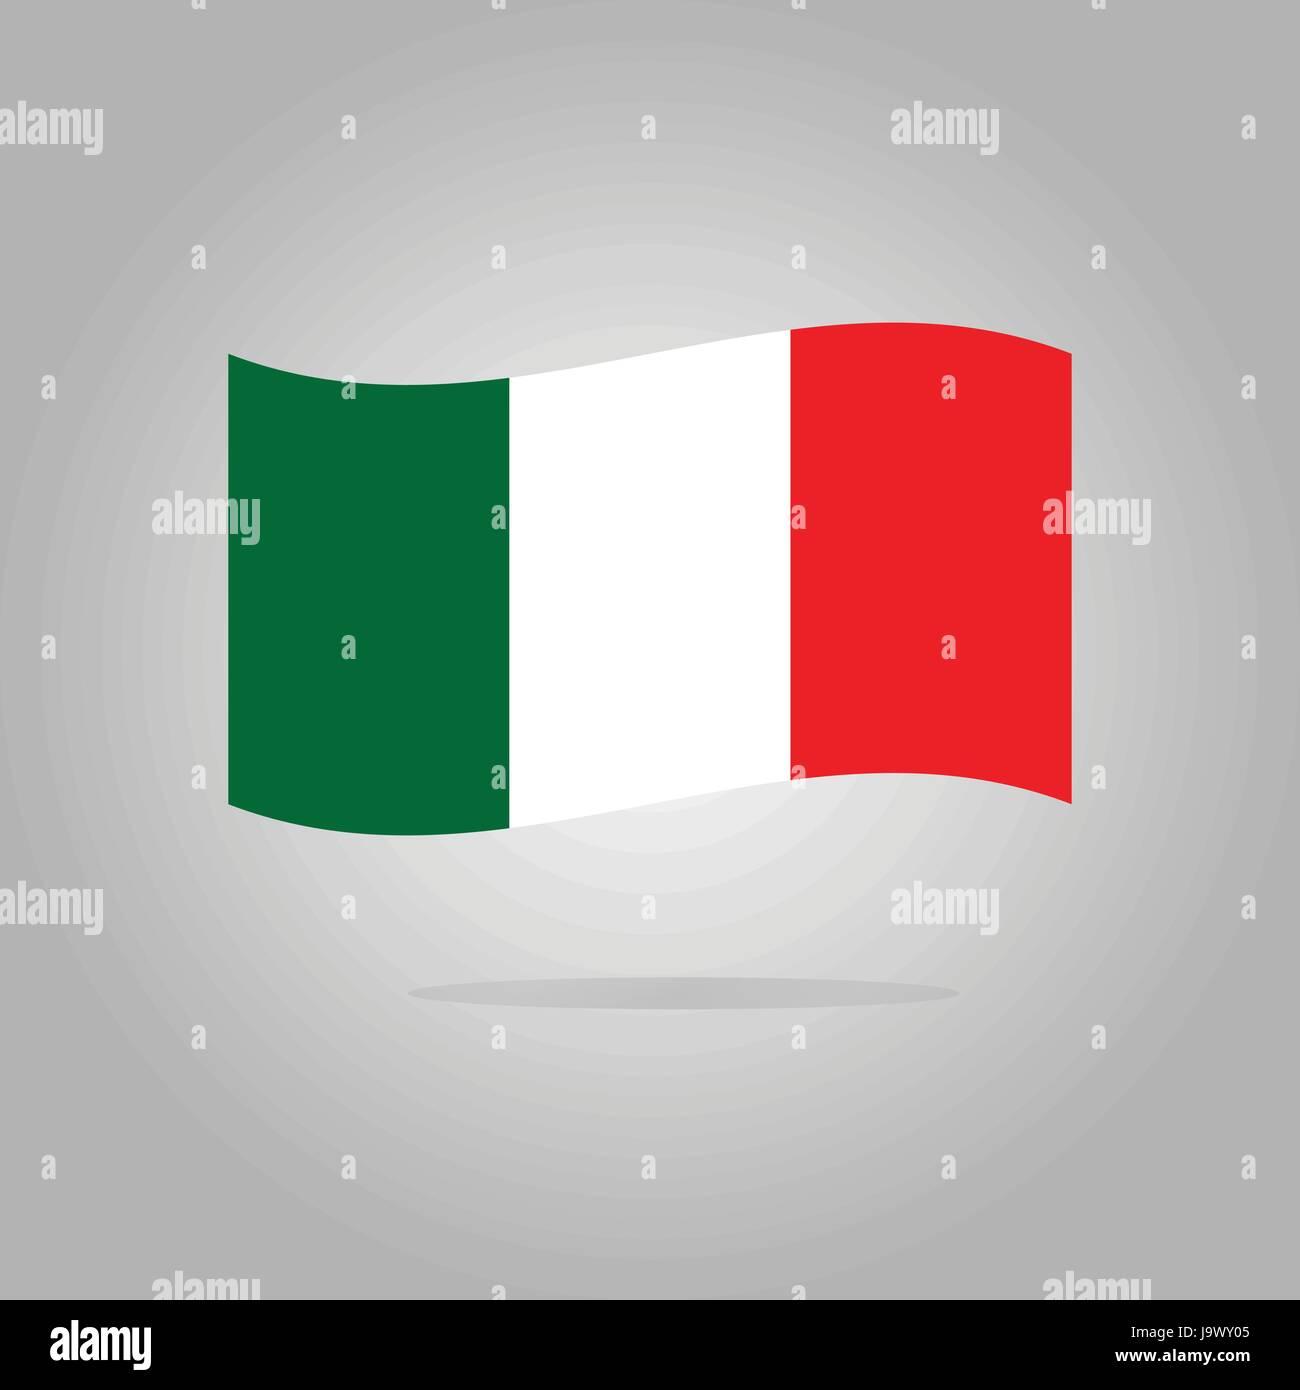 Italy flag design illustration - Stock Vector